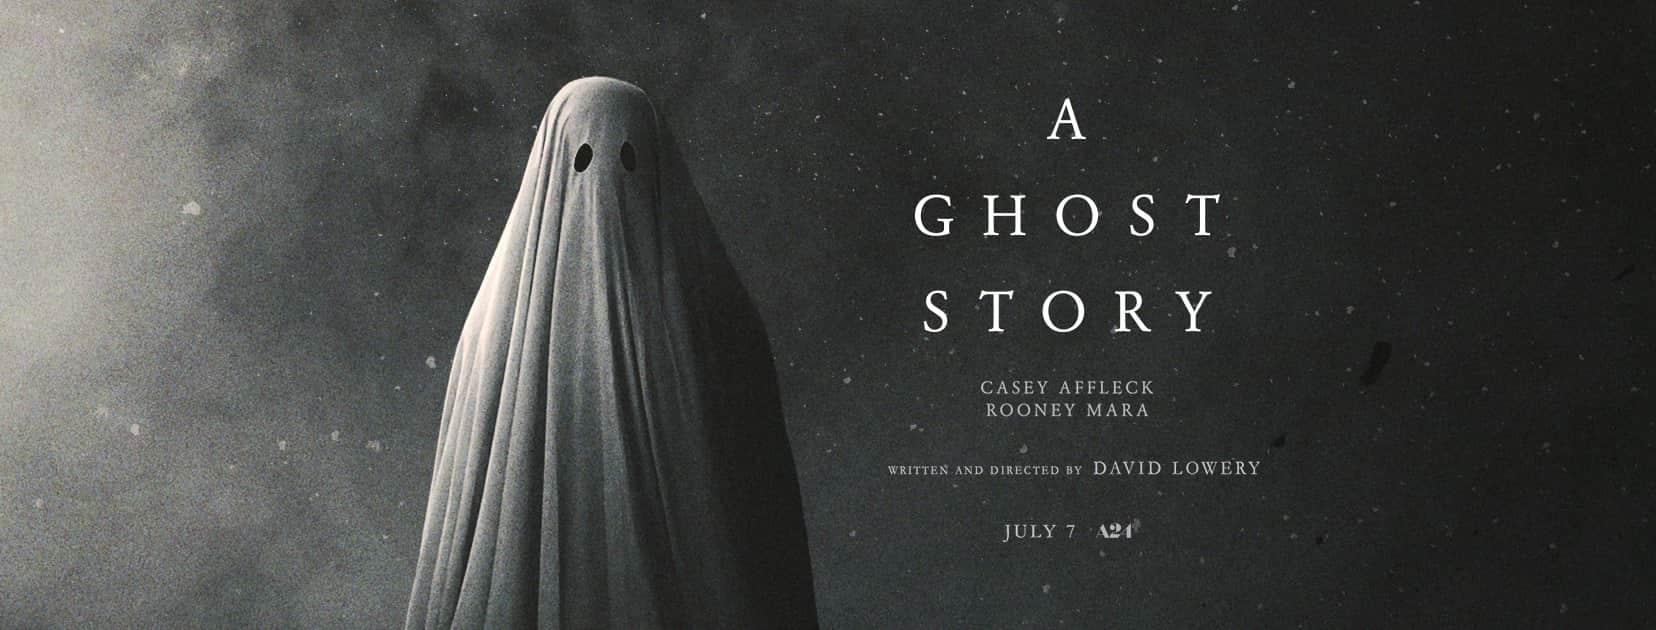 A Ghost Story: فیلمی اگزیستانسیالیست با محوریت دنیای پس از مرگ